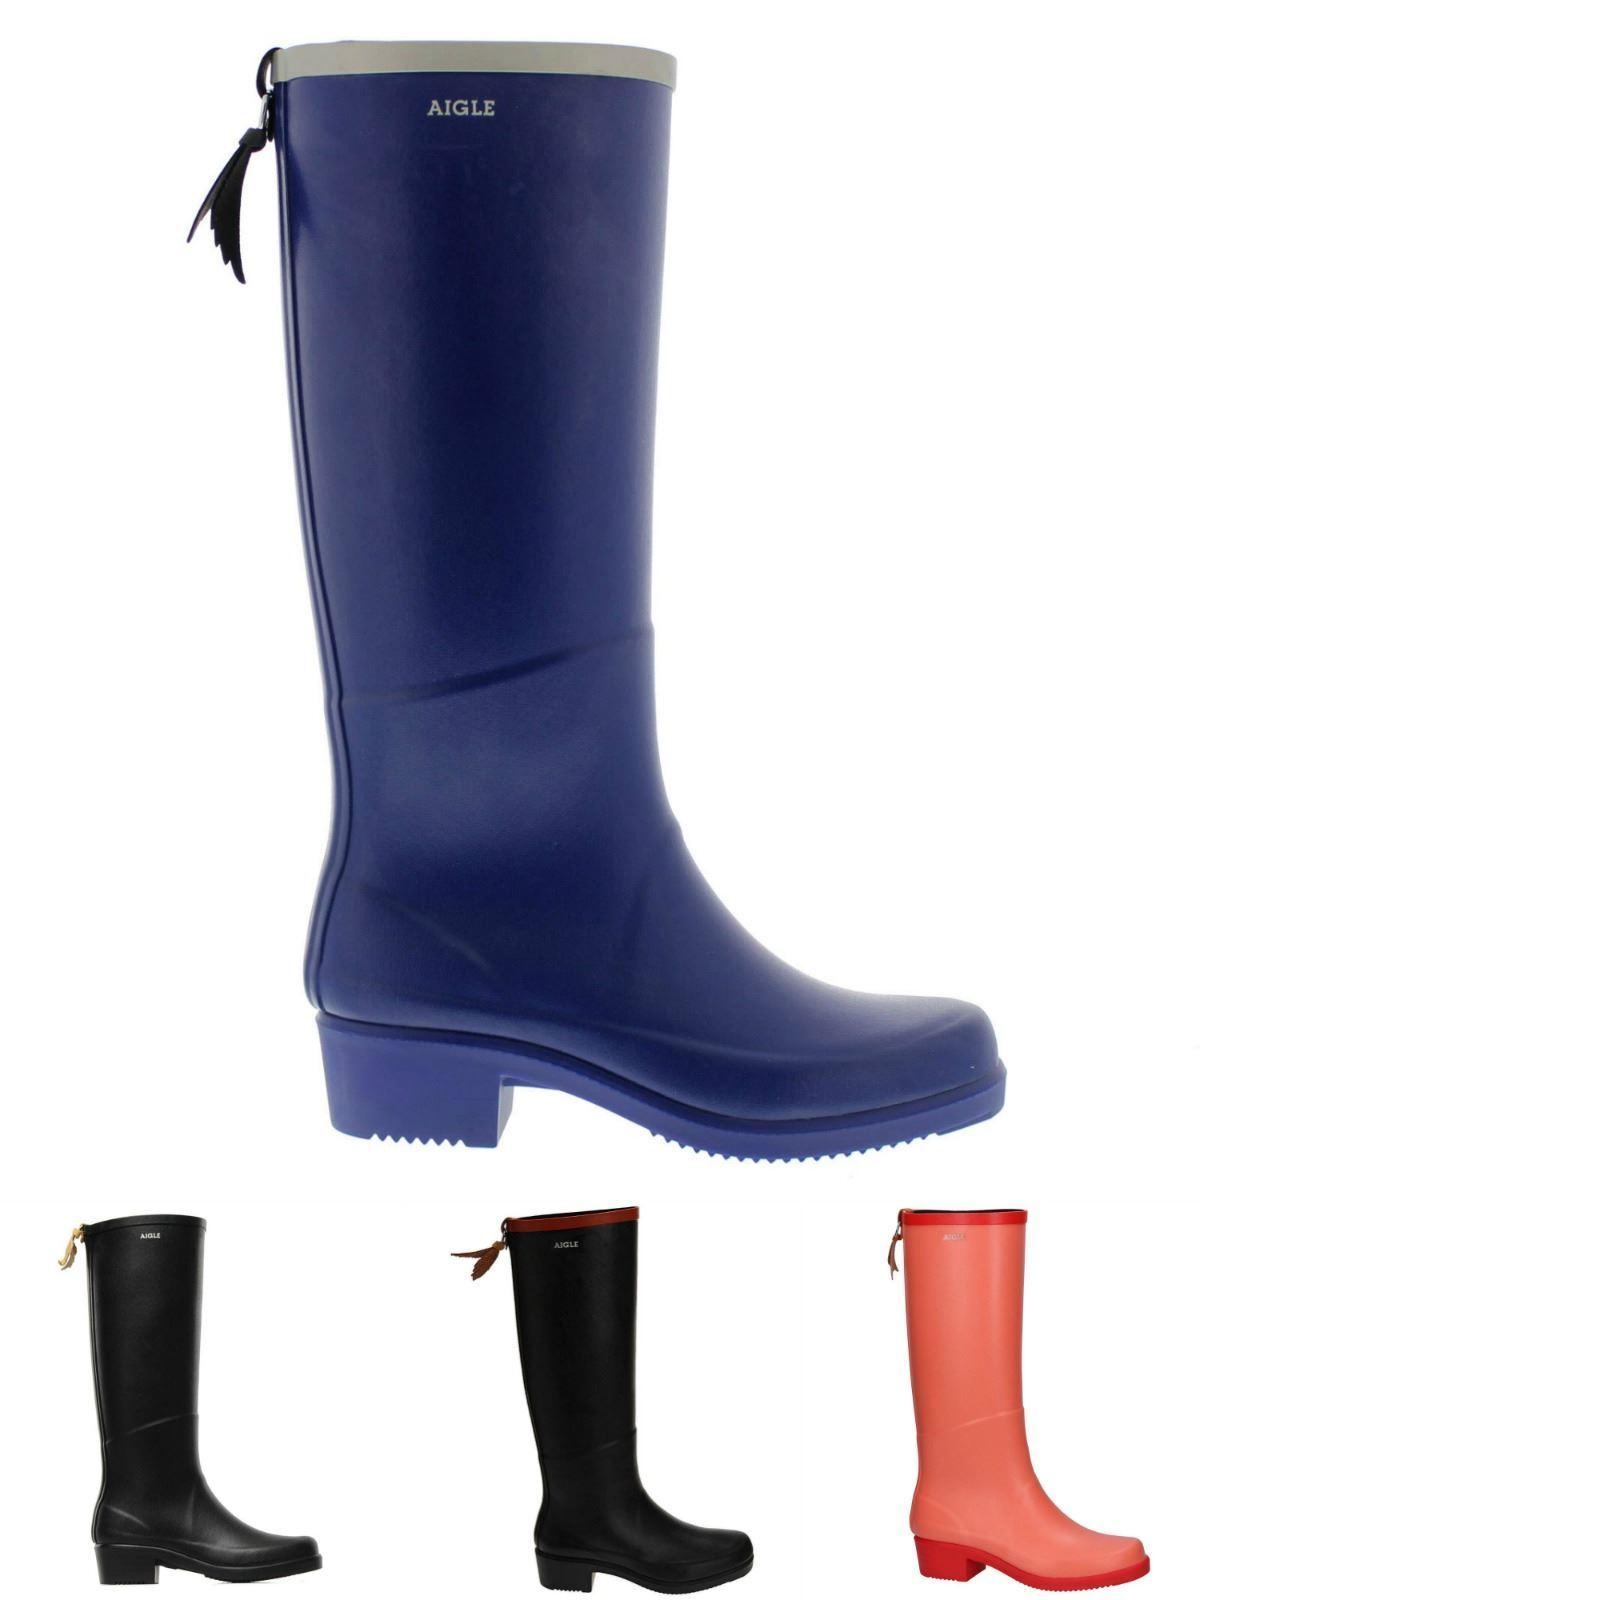 Grandes zapatos con descuento Aigle Miss Juliette Tall Womens Boots